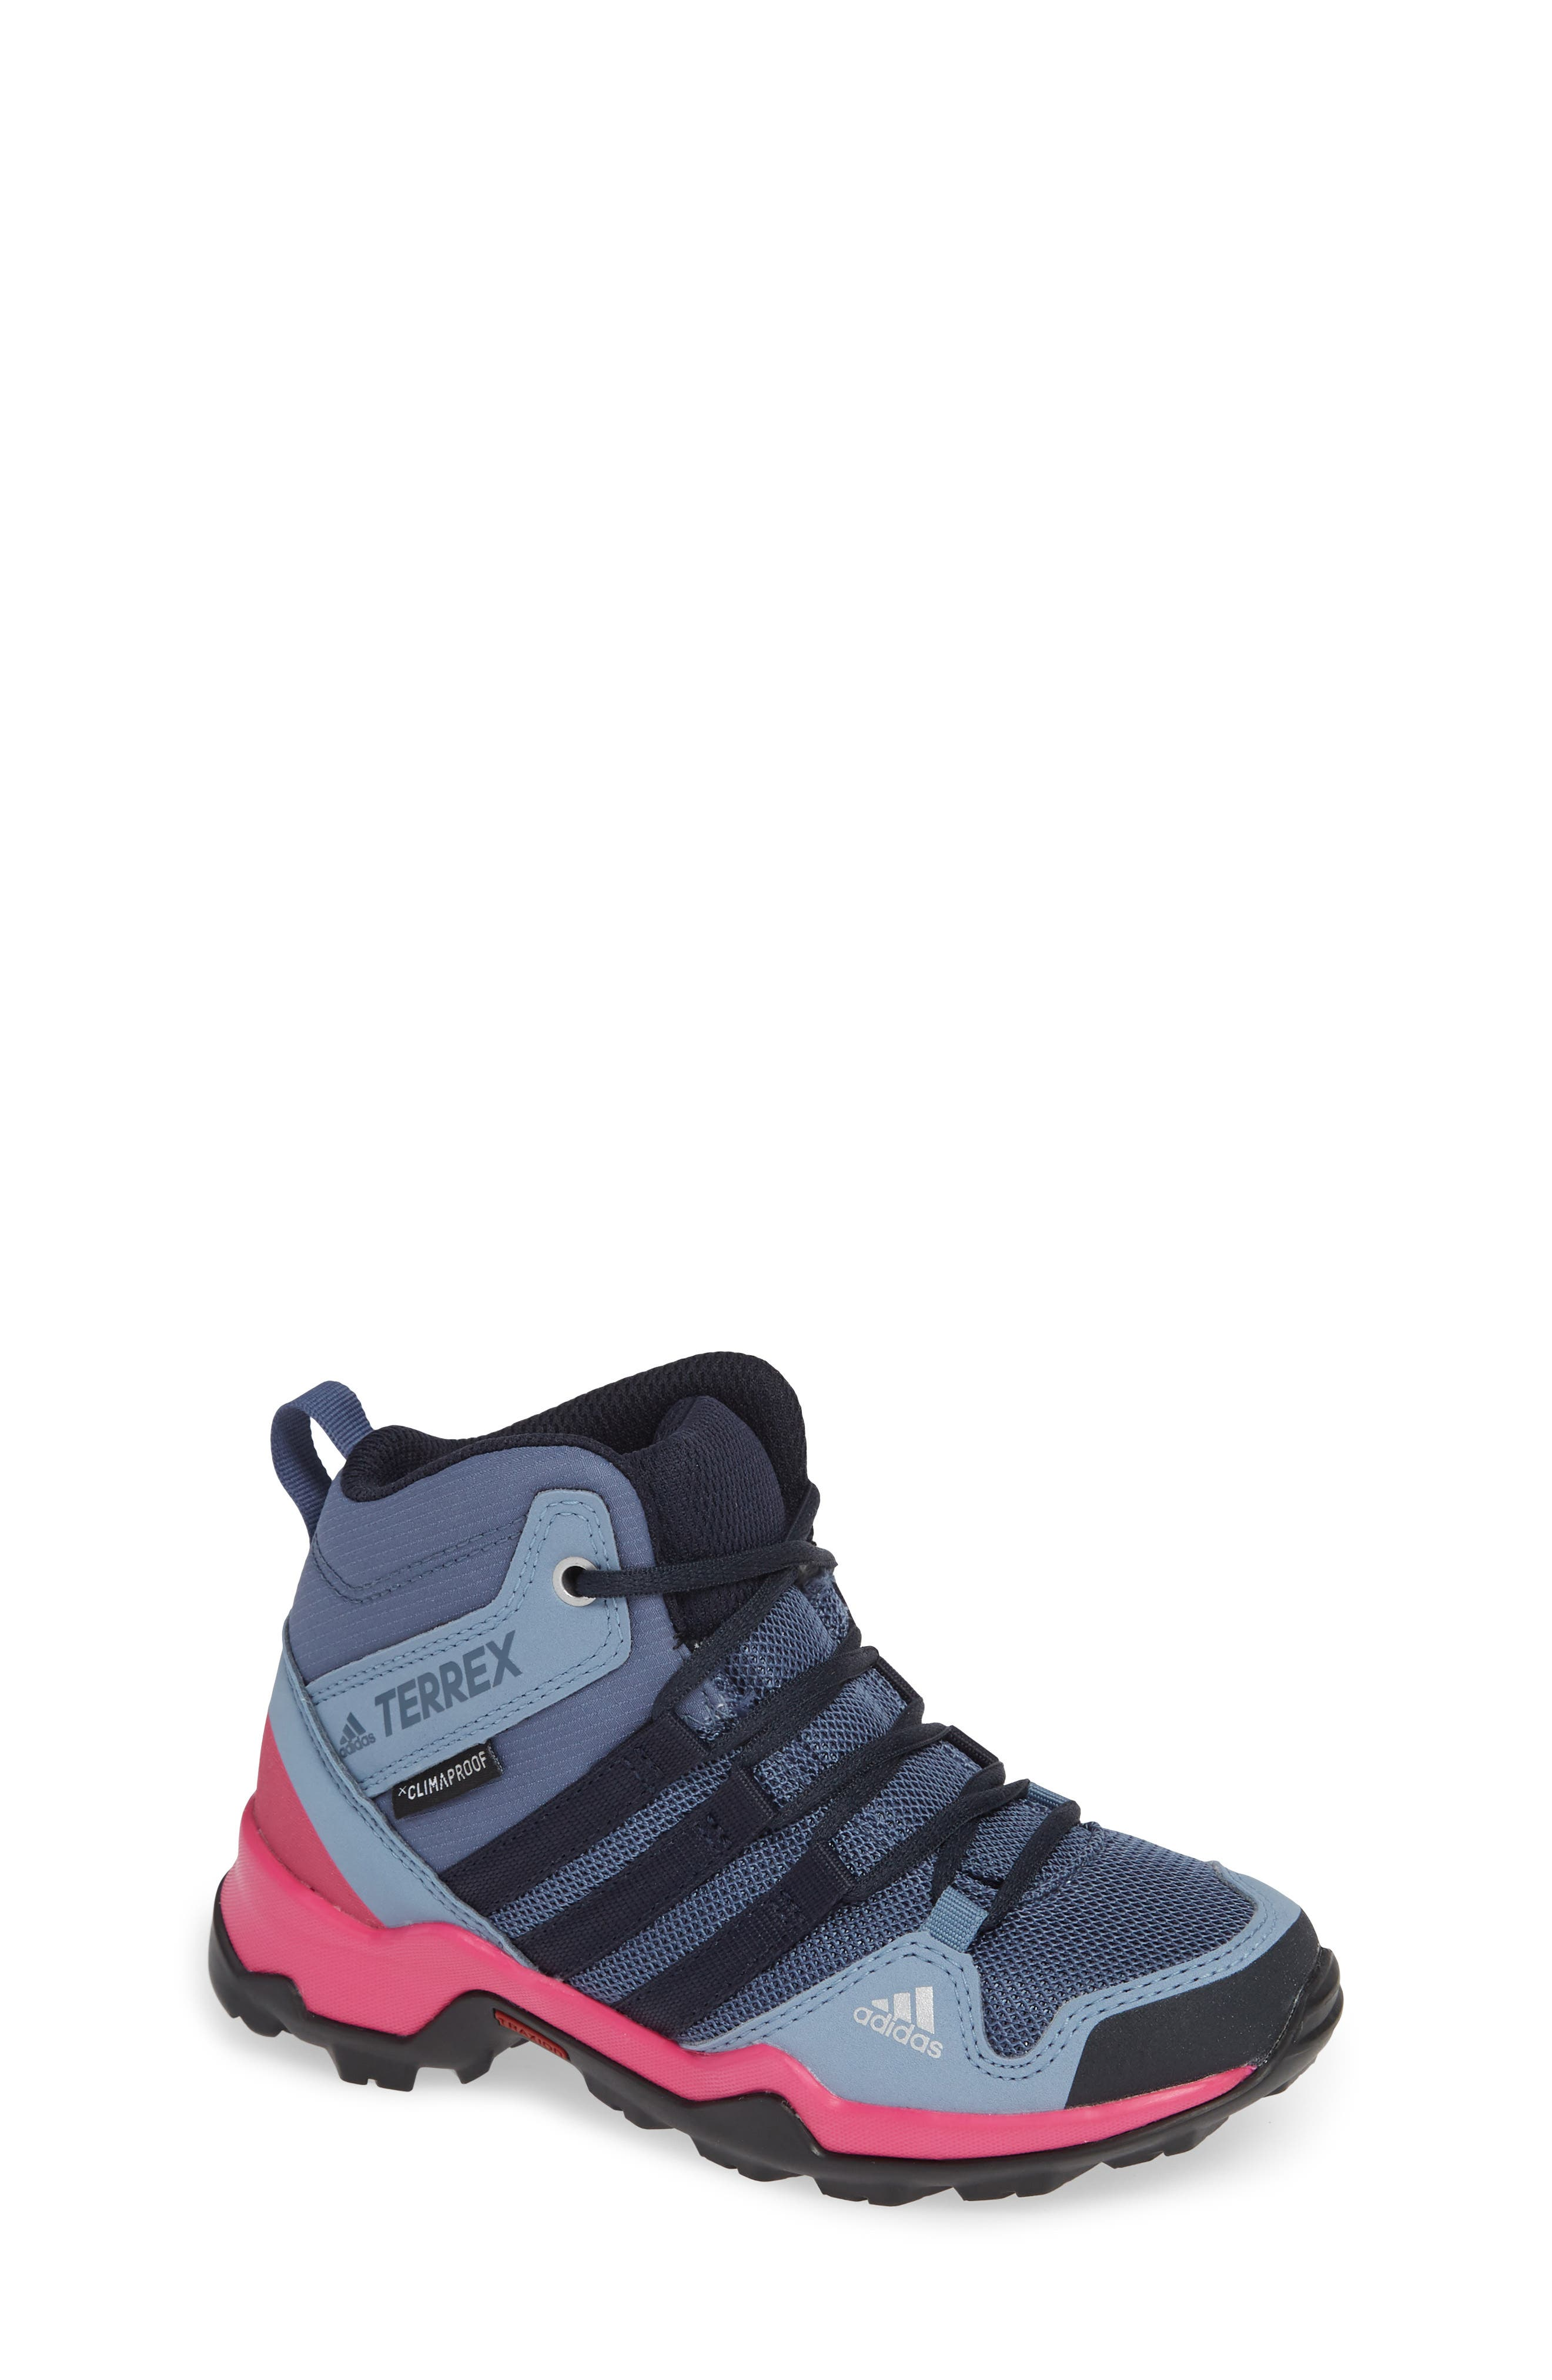 4548fa3e72cf2 Girls' Adidas Shoes   Nordstrom